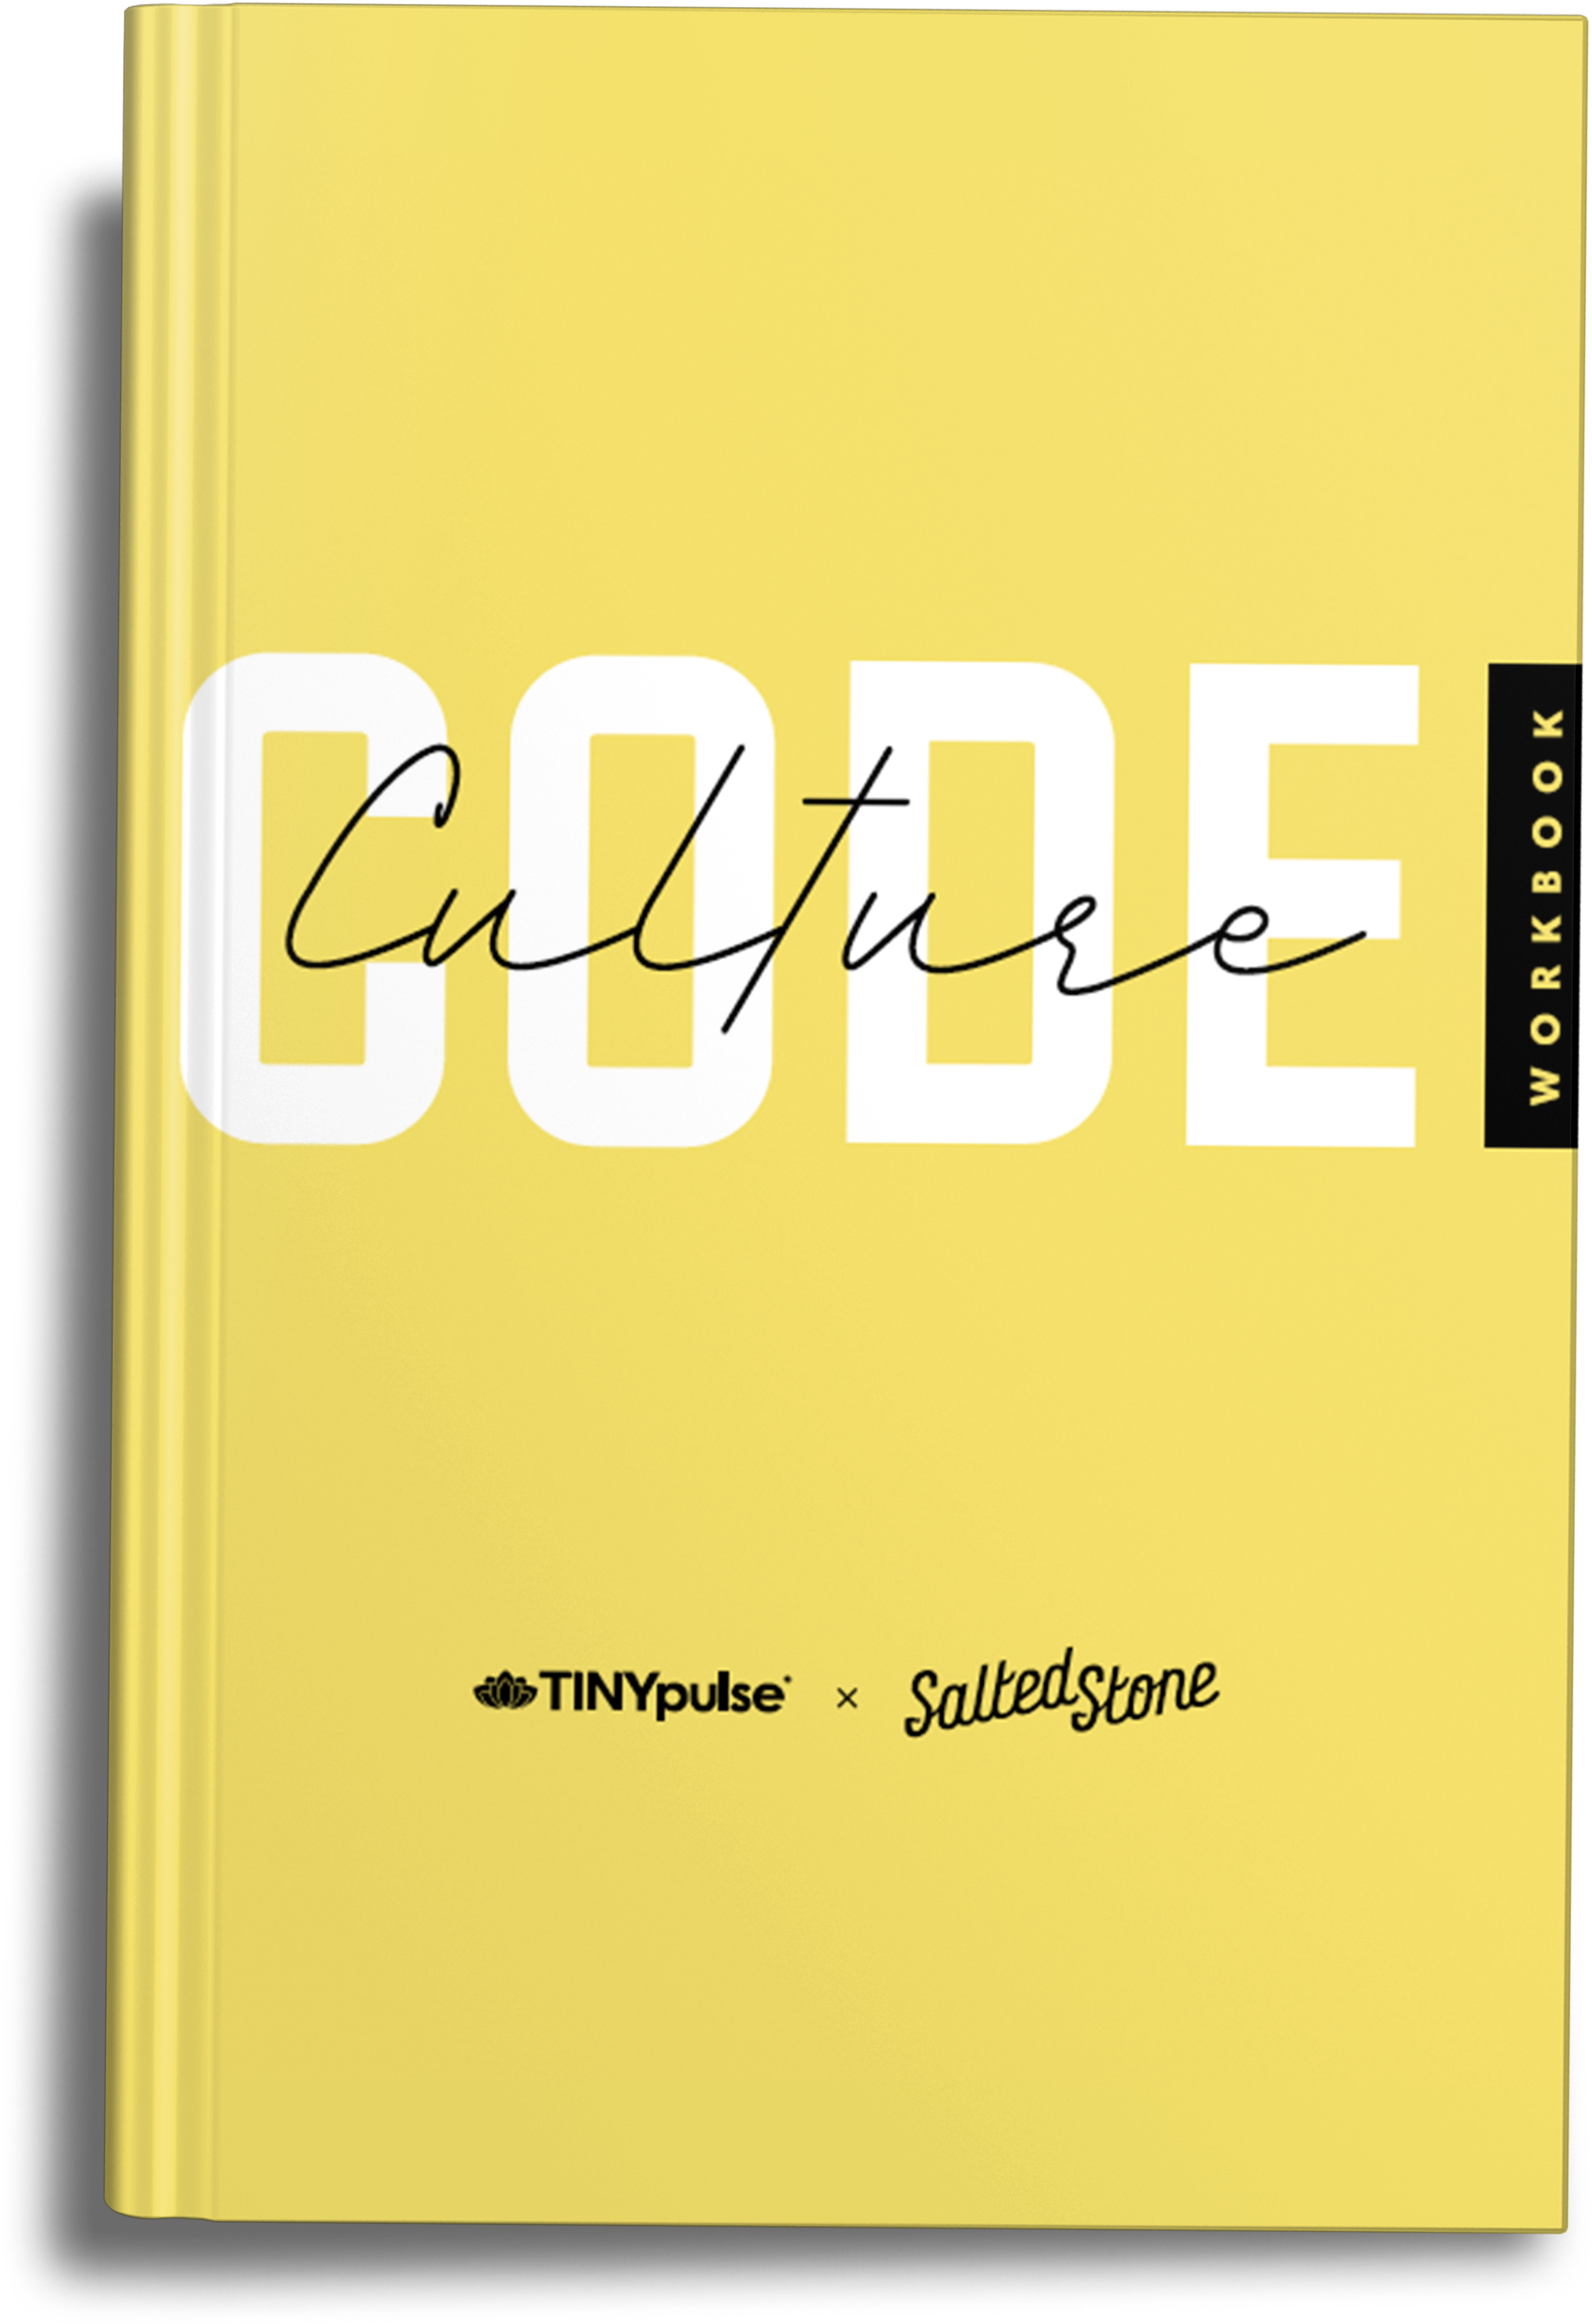 Culture Code Workbook mockup 2-2